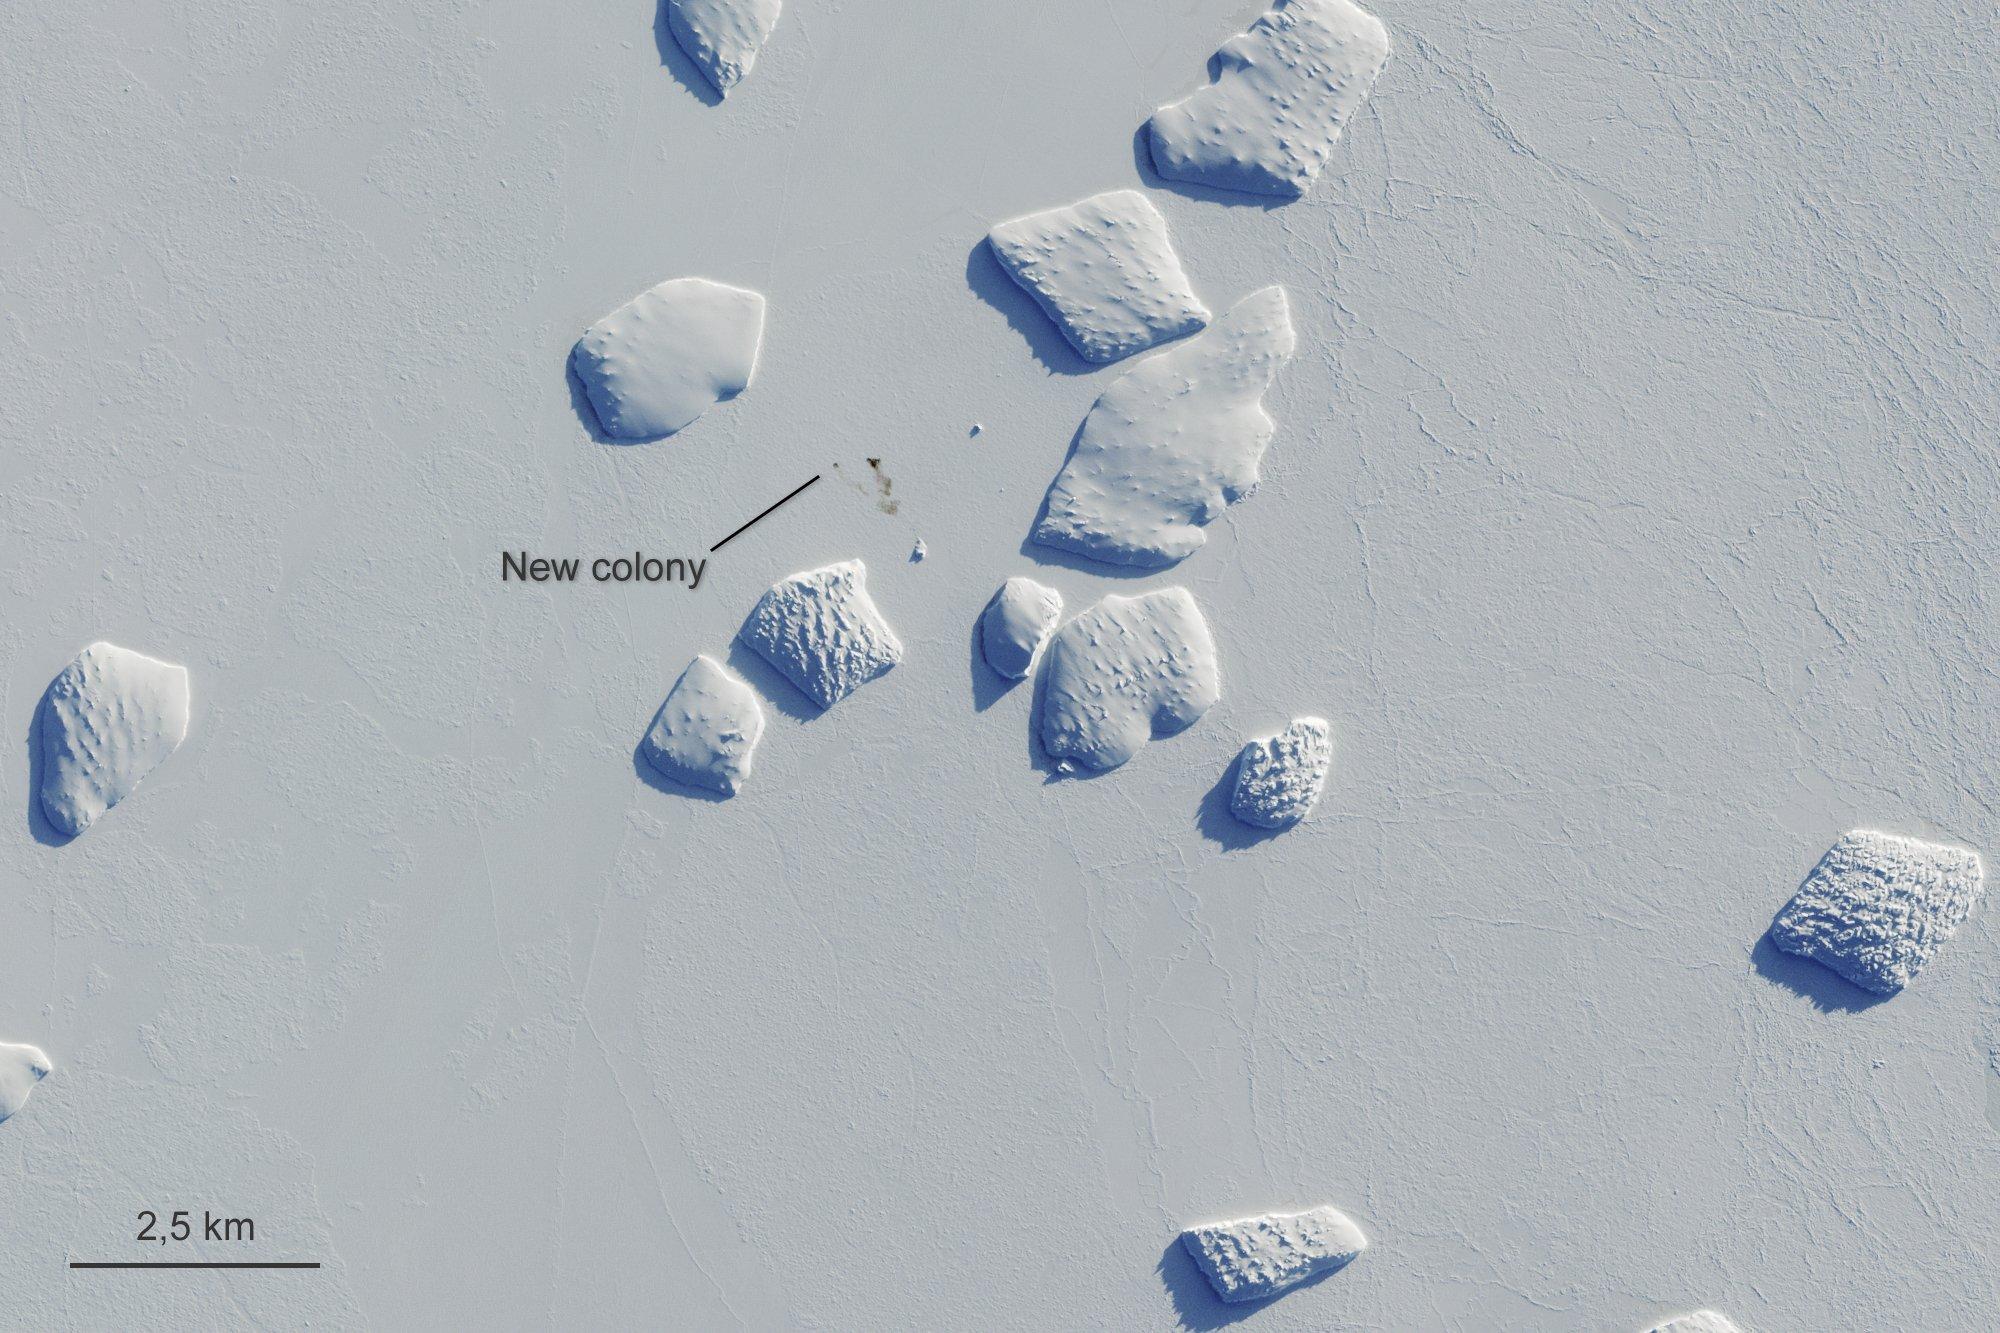 Poop scoop: Satellite images reveal Antarctic penguin haunts